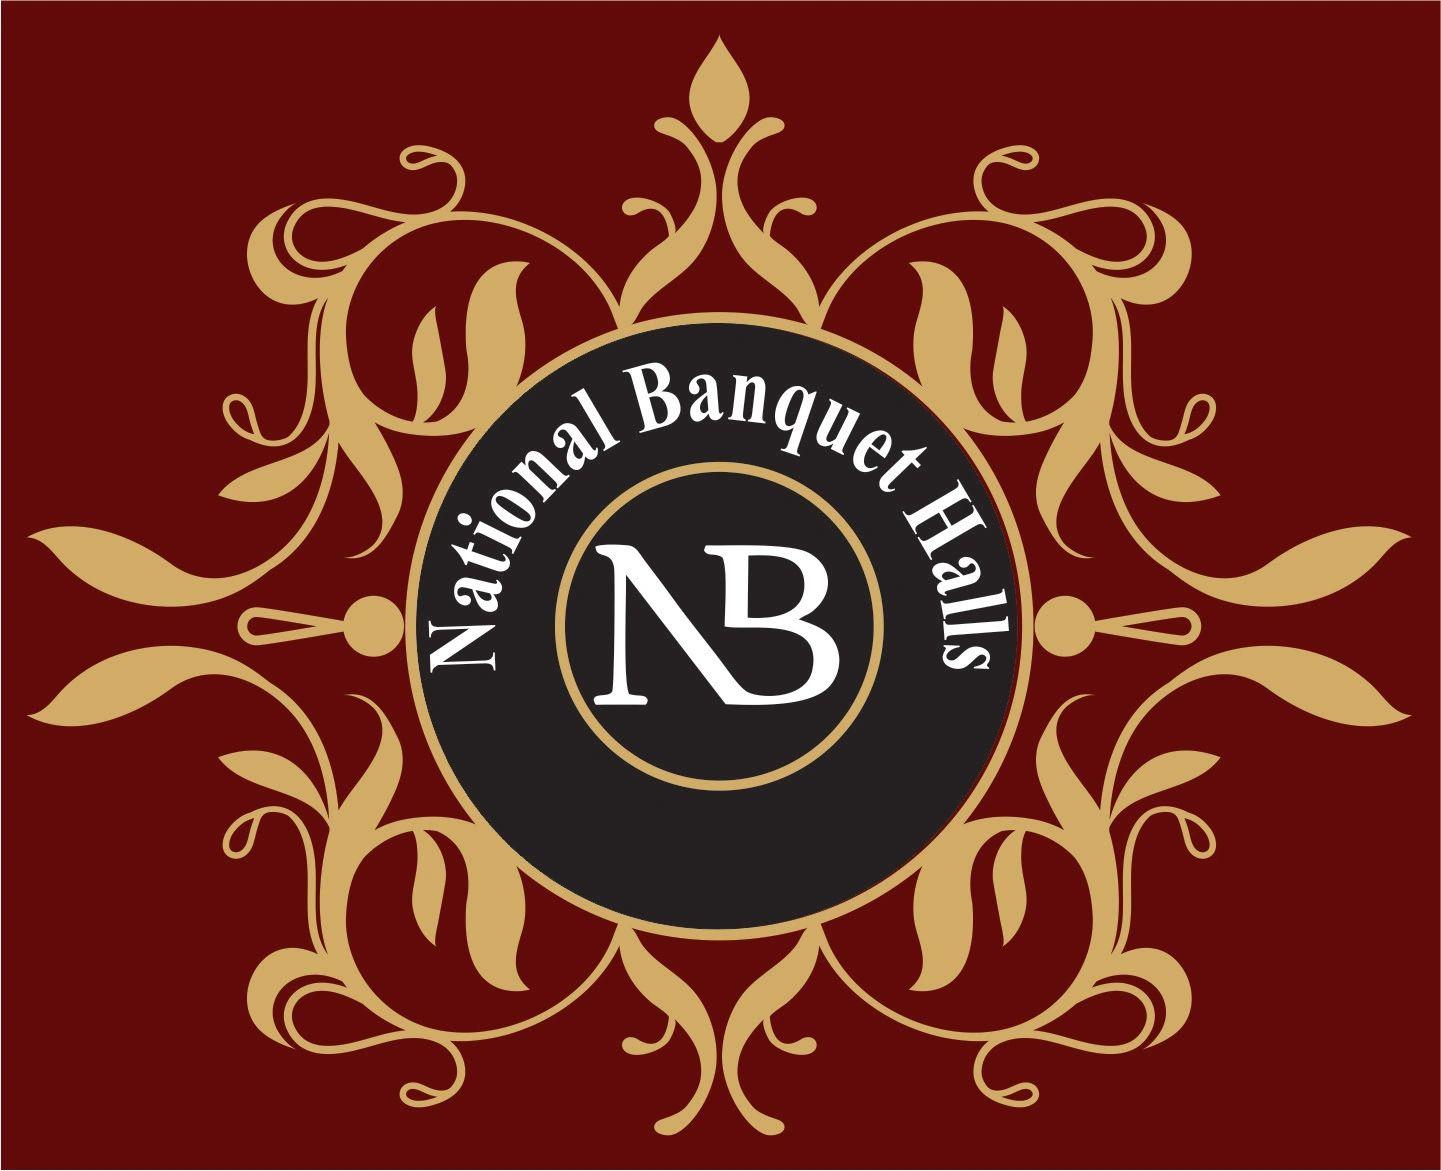 National Banquet Hall